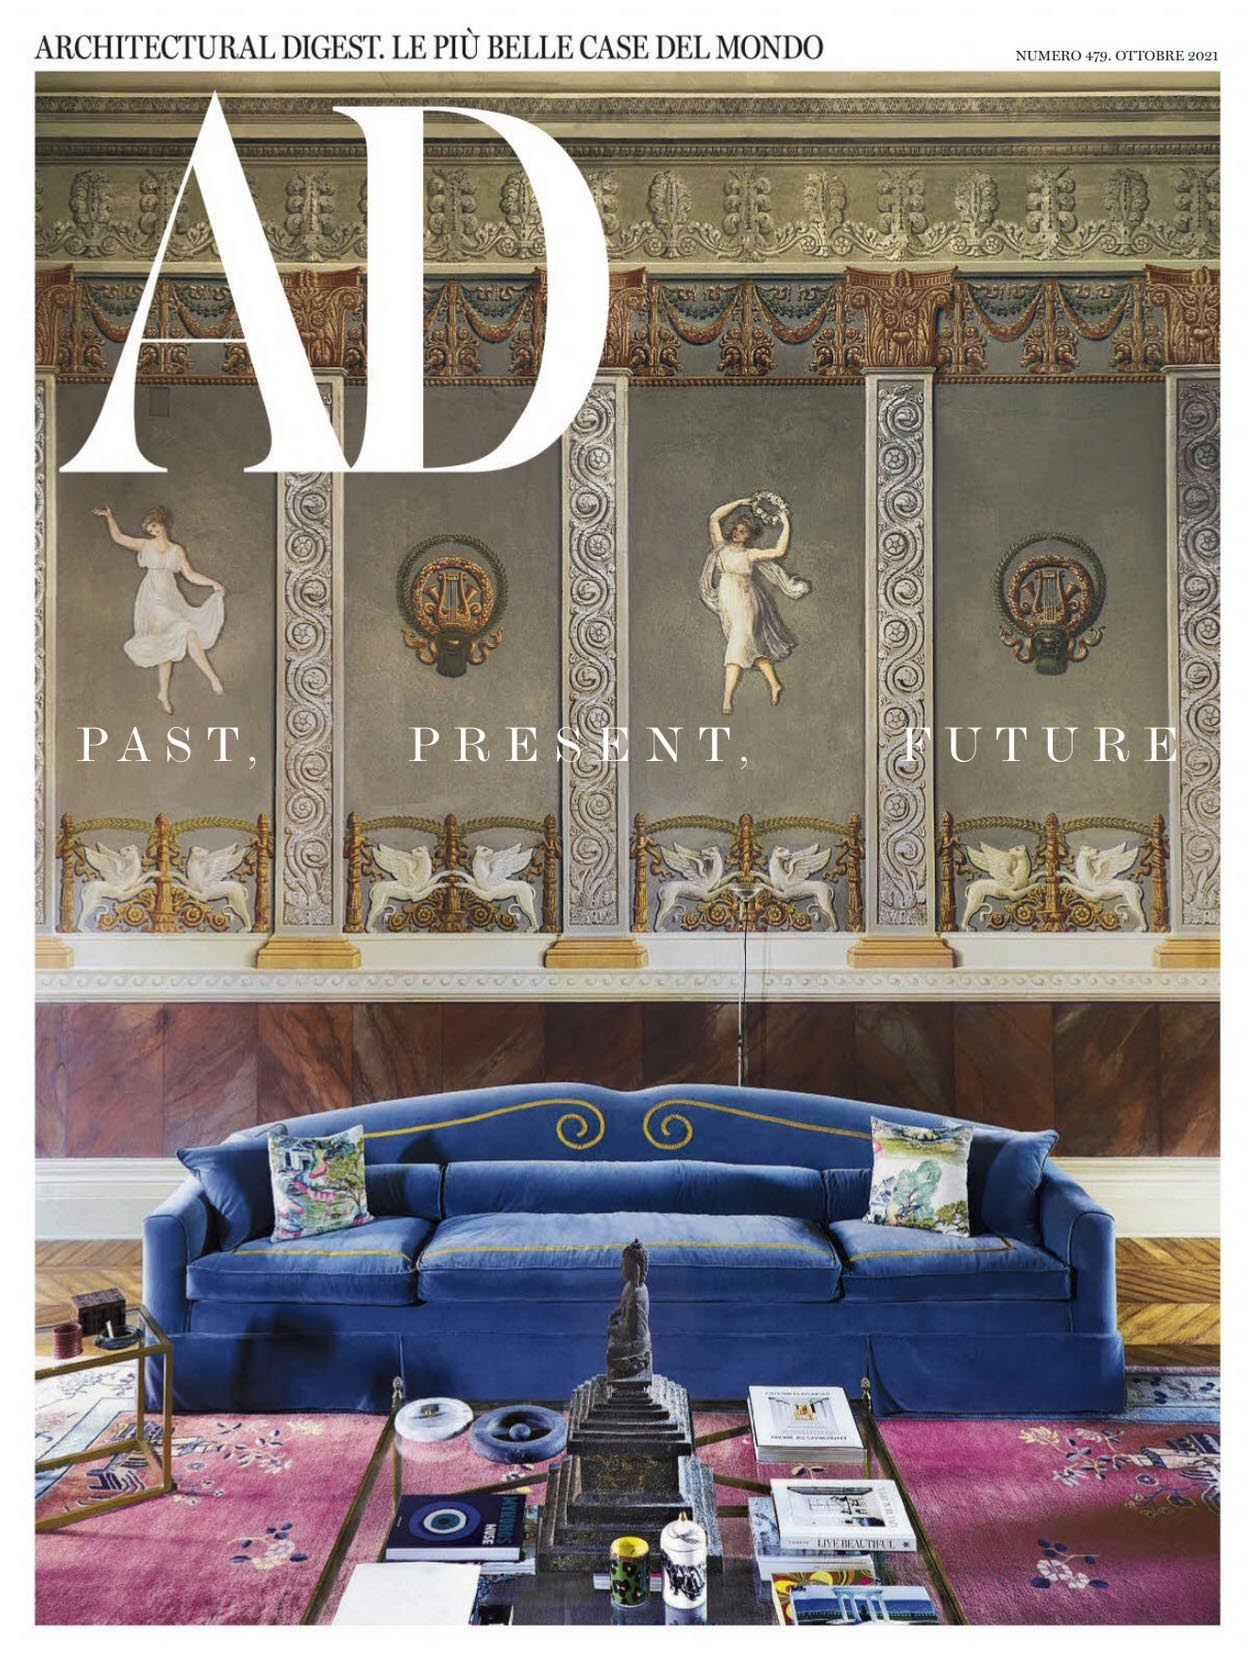 《AD》意大利版室内设计杂志2021年10月号